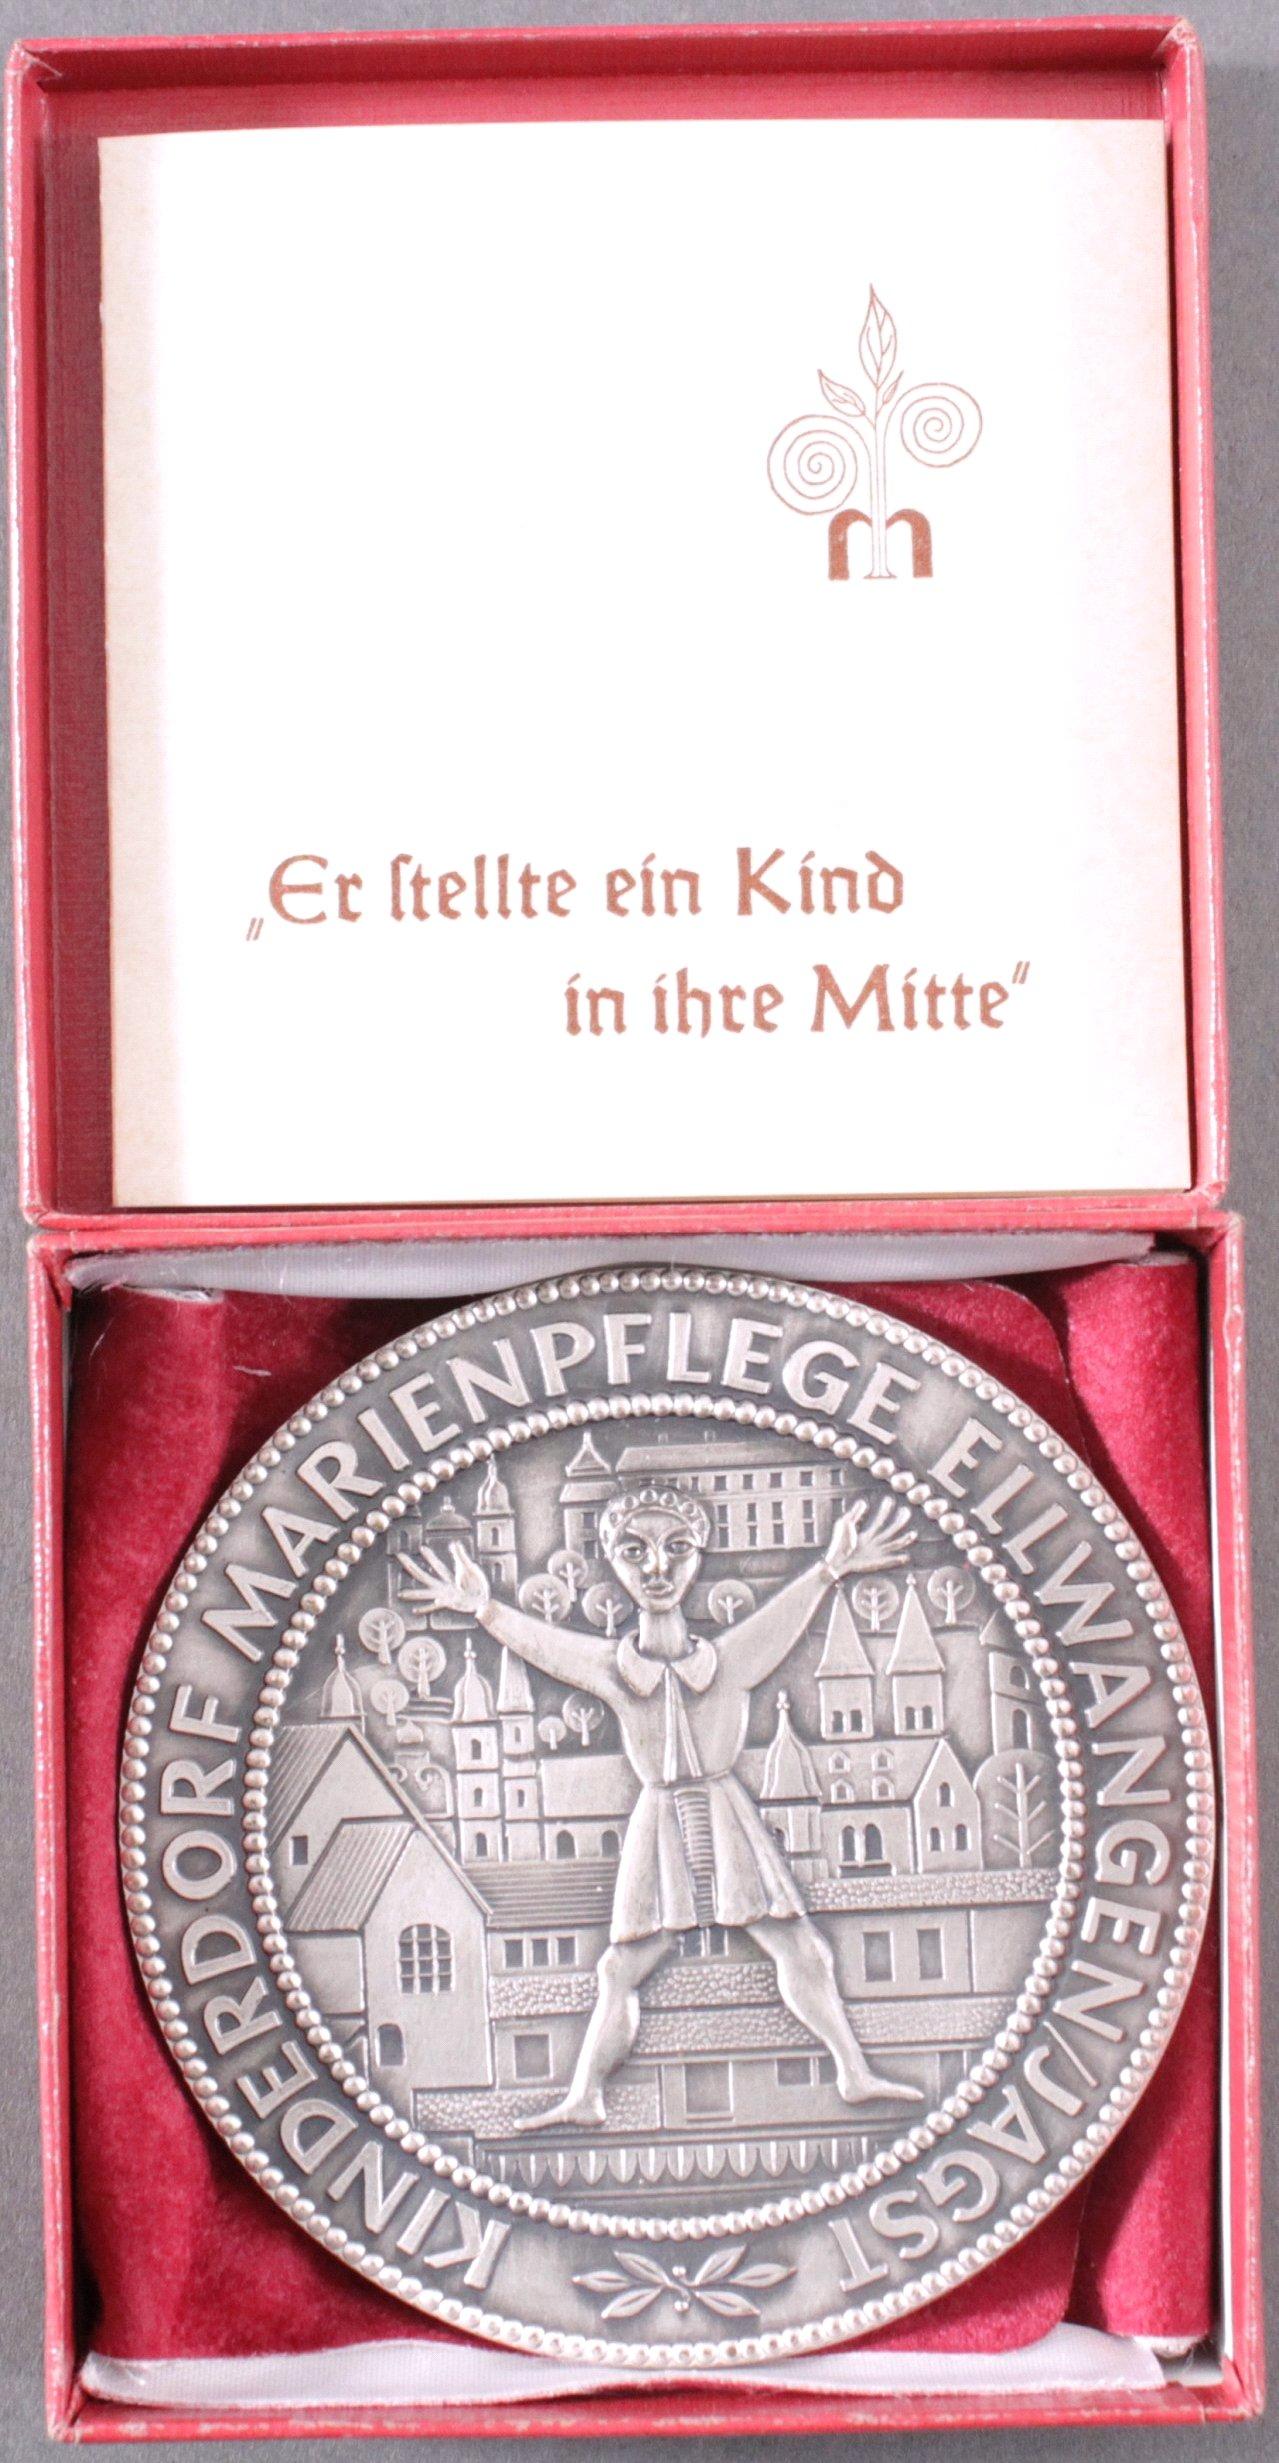 Medaille Entwurf Karl Heinz Knoedler